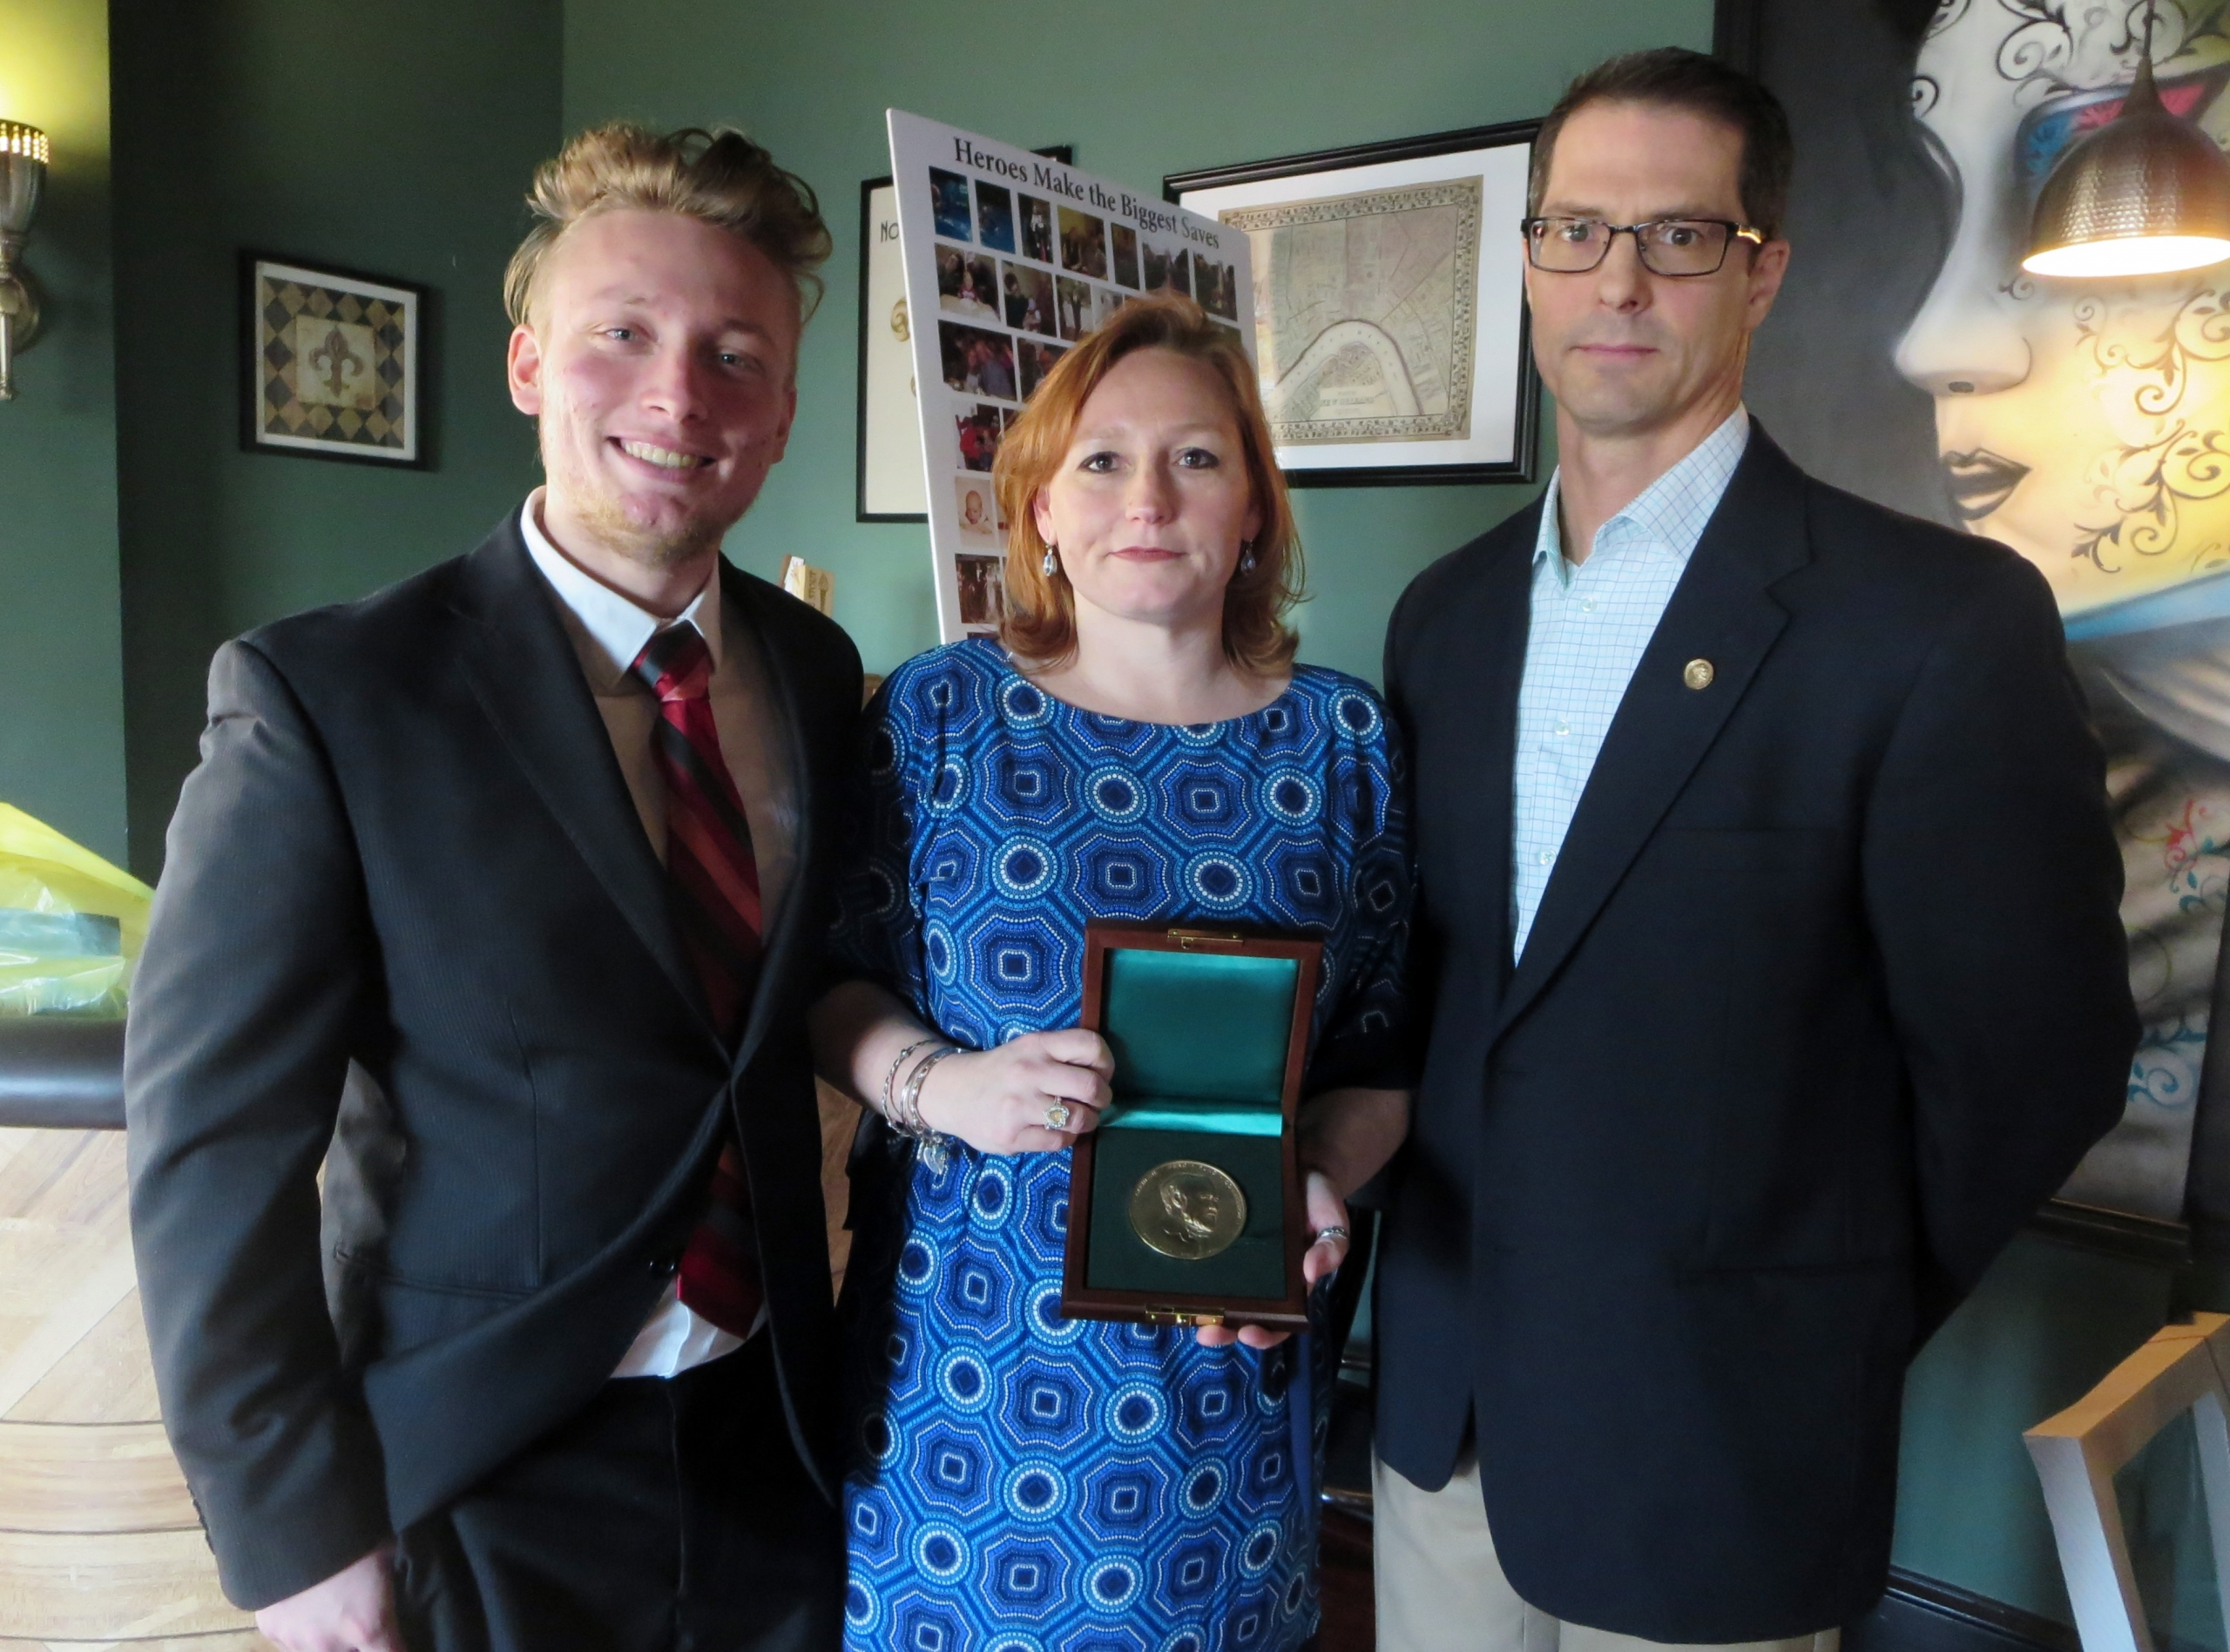 Carnegie Medal presentation to Michael J. Manley